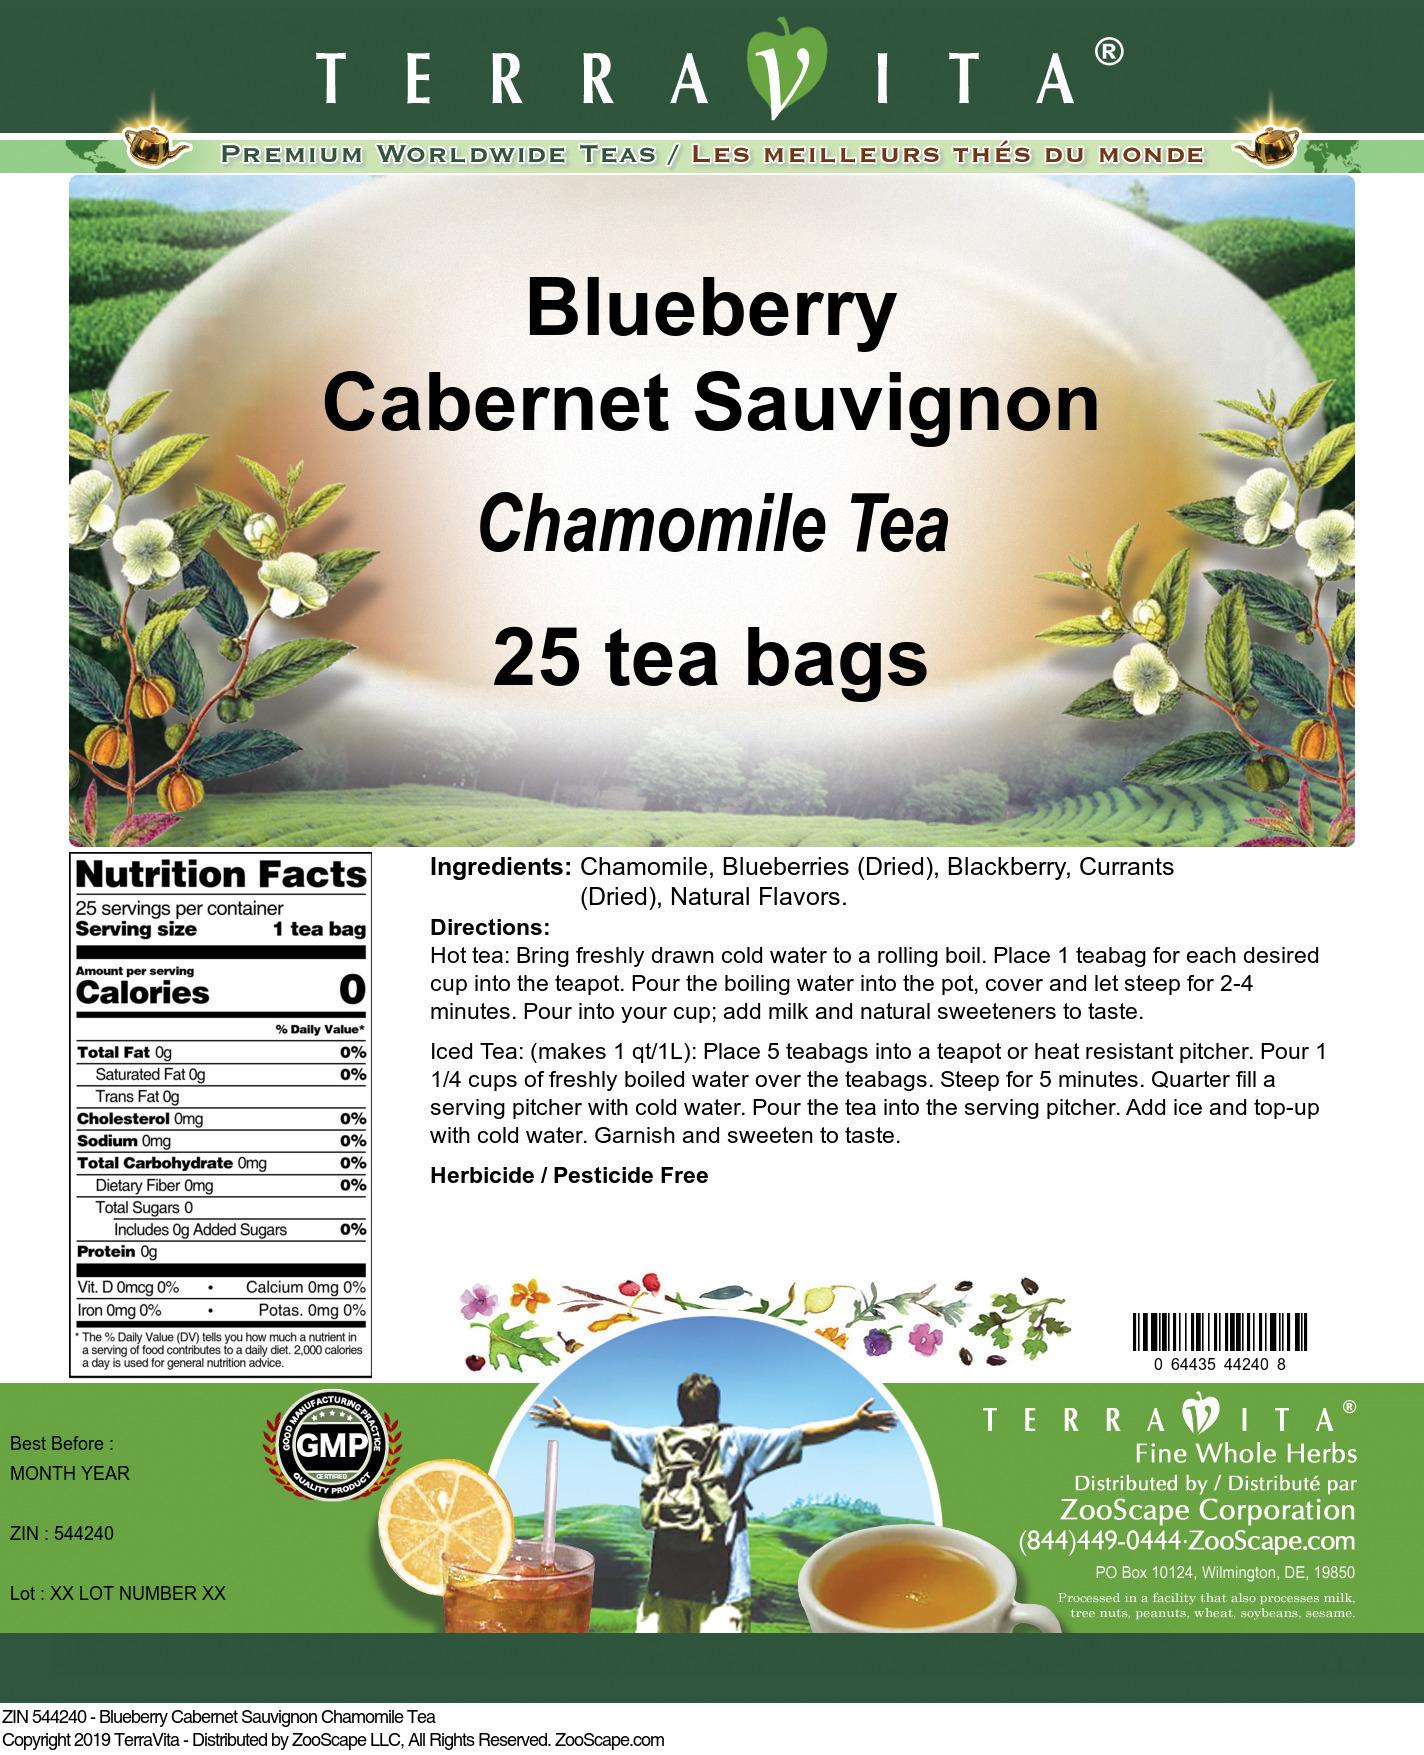 Blueberry Cabernet Sauvignon Chamomile Tea